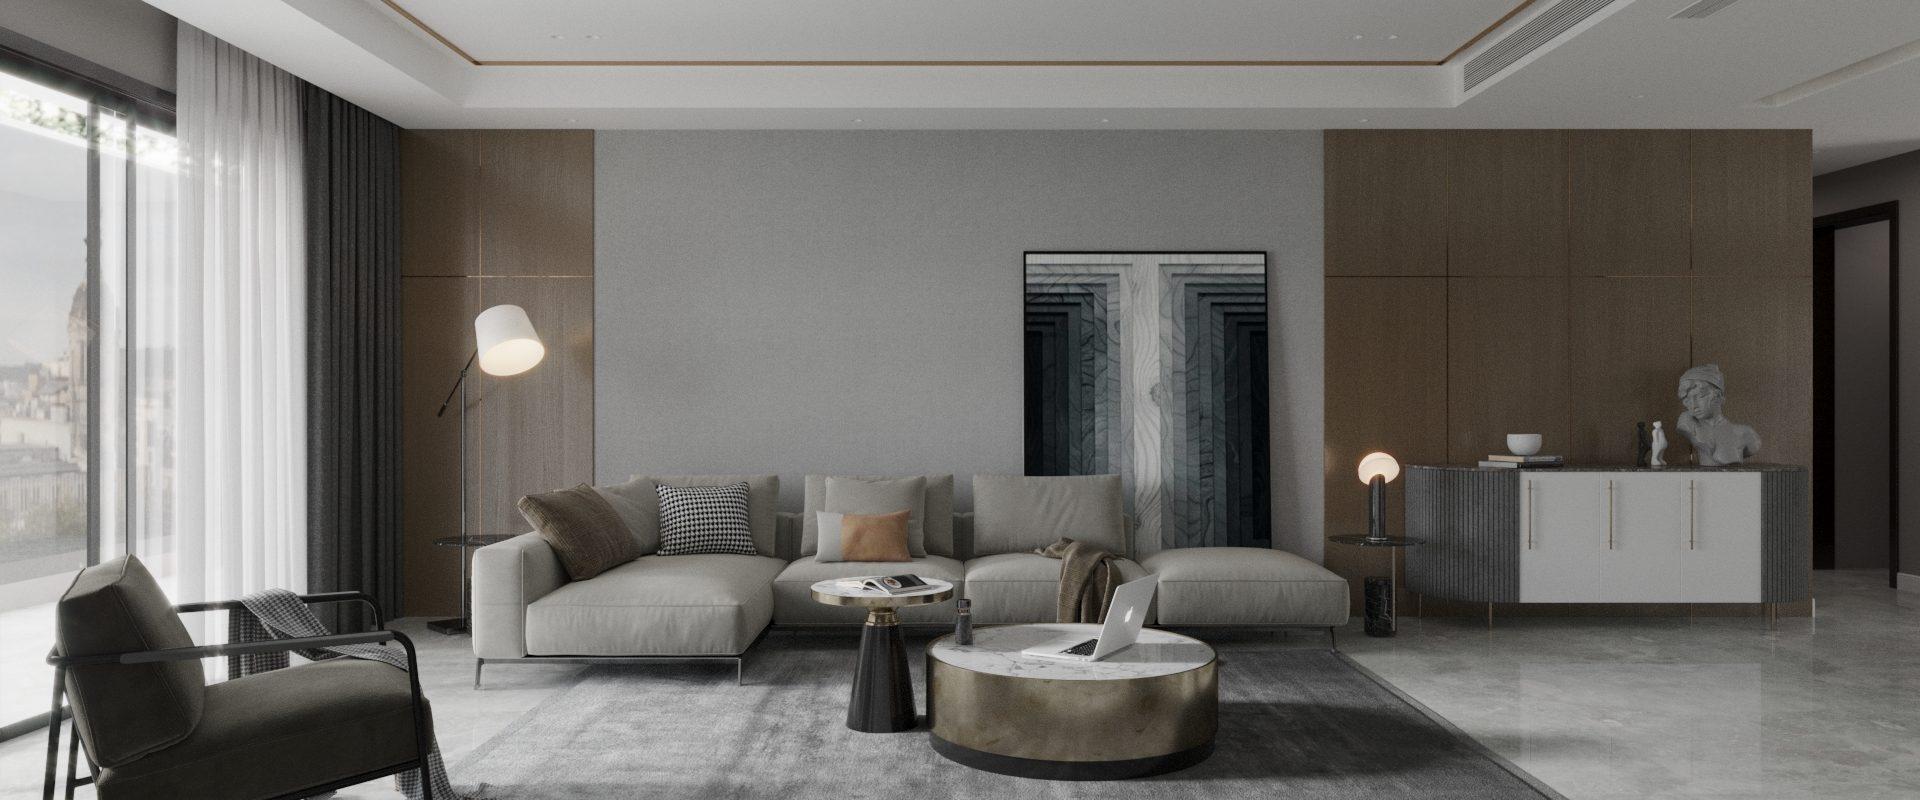 Villa dekorasyon_tasarim_000003_R_0001